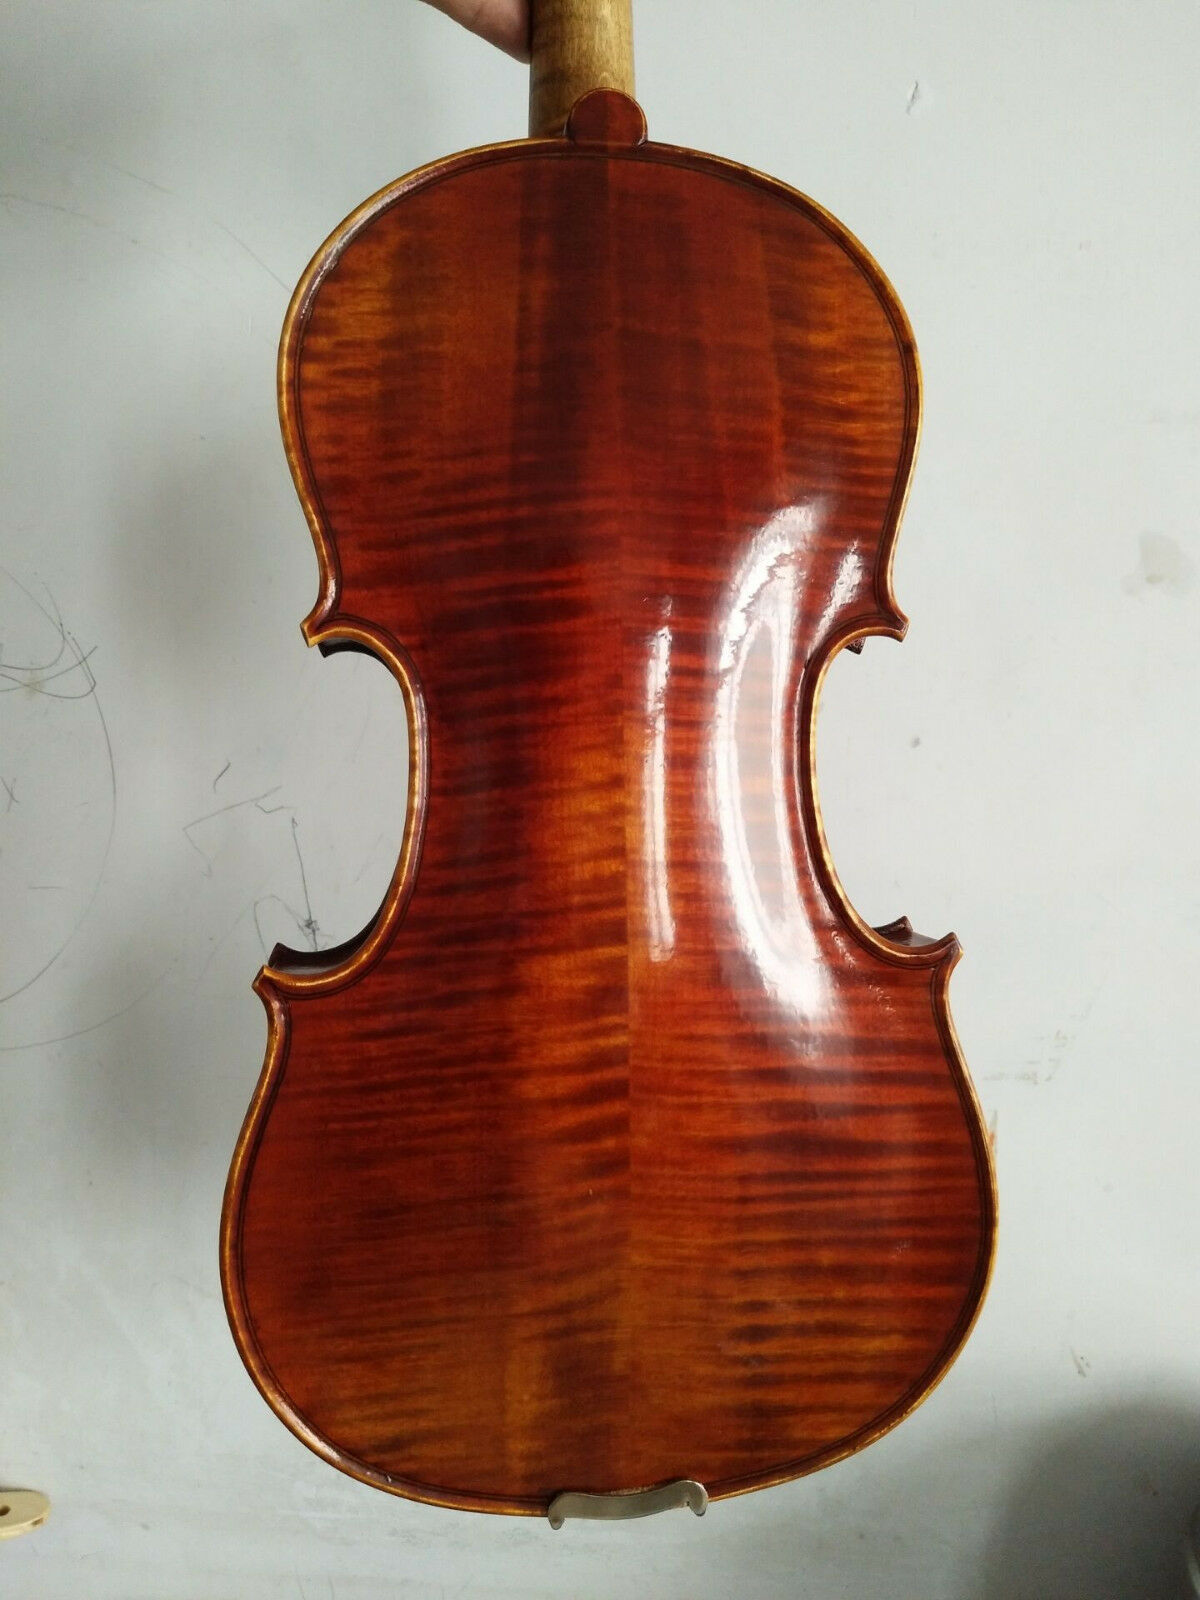 Master 4 4 Violin European tone wood flamed maple old spruce top nice tone